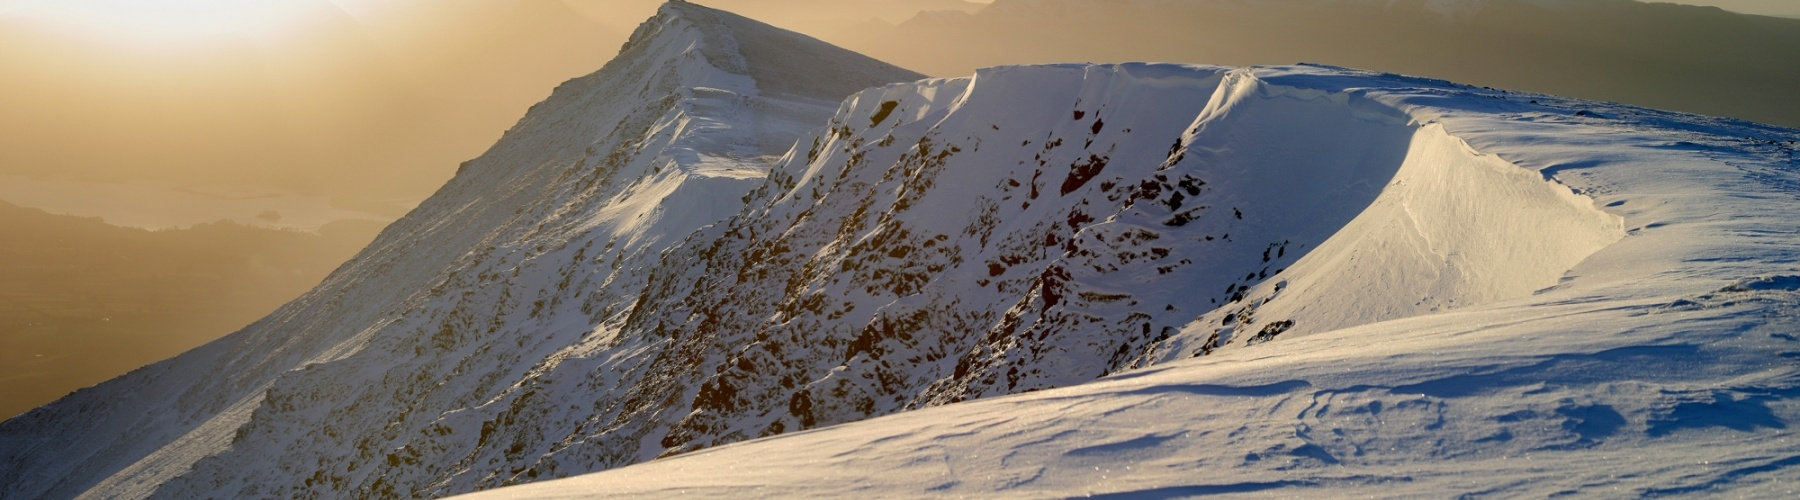 P0057-Corniced-Ridge-on-Bencathra